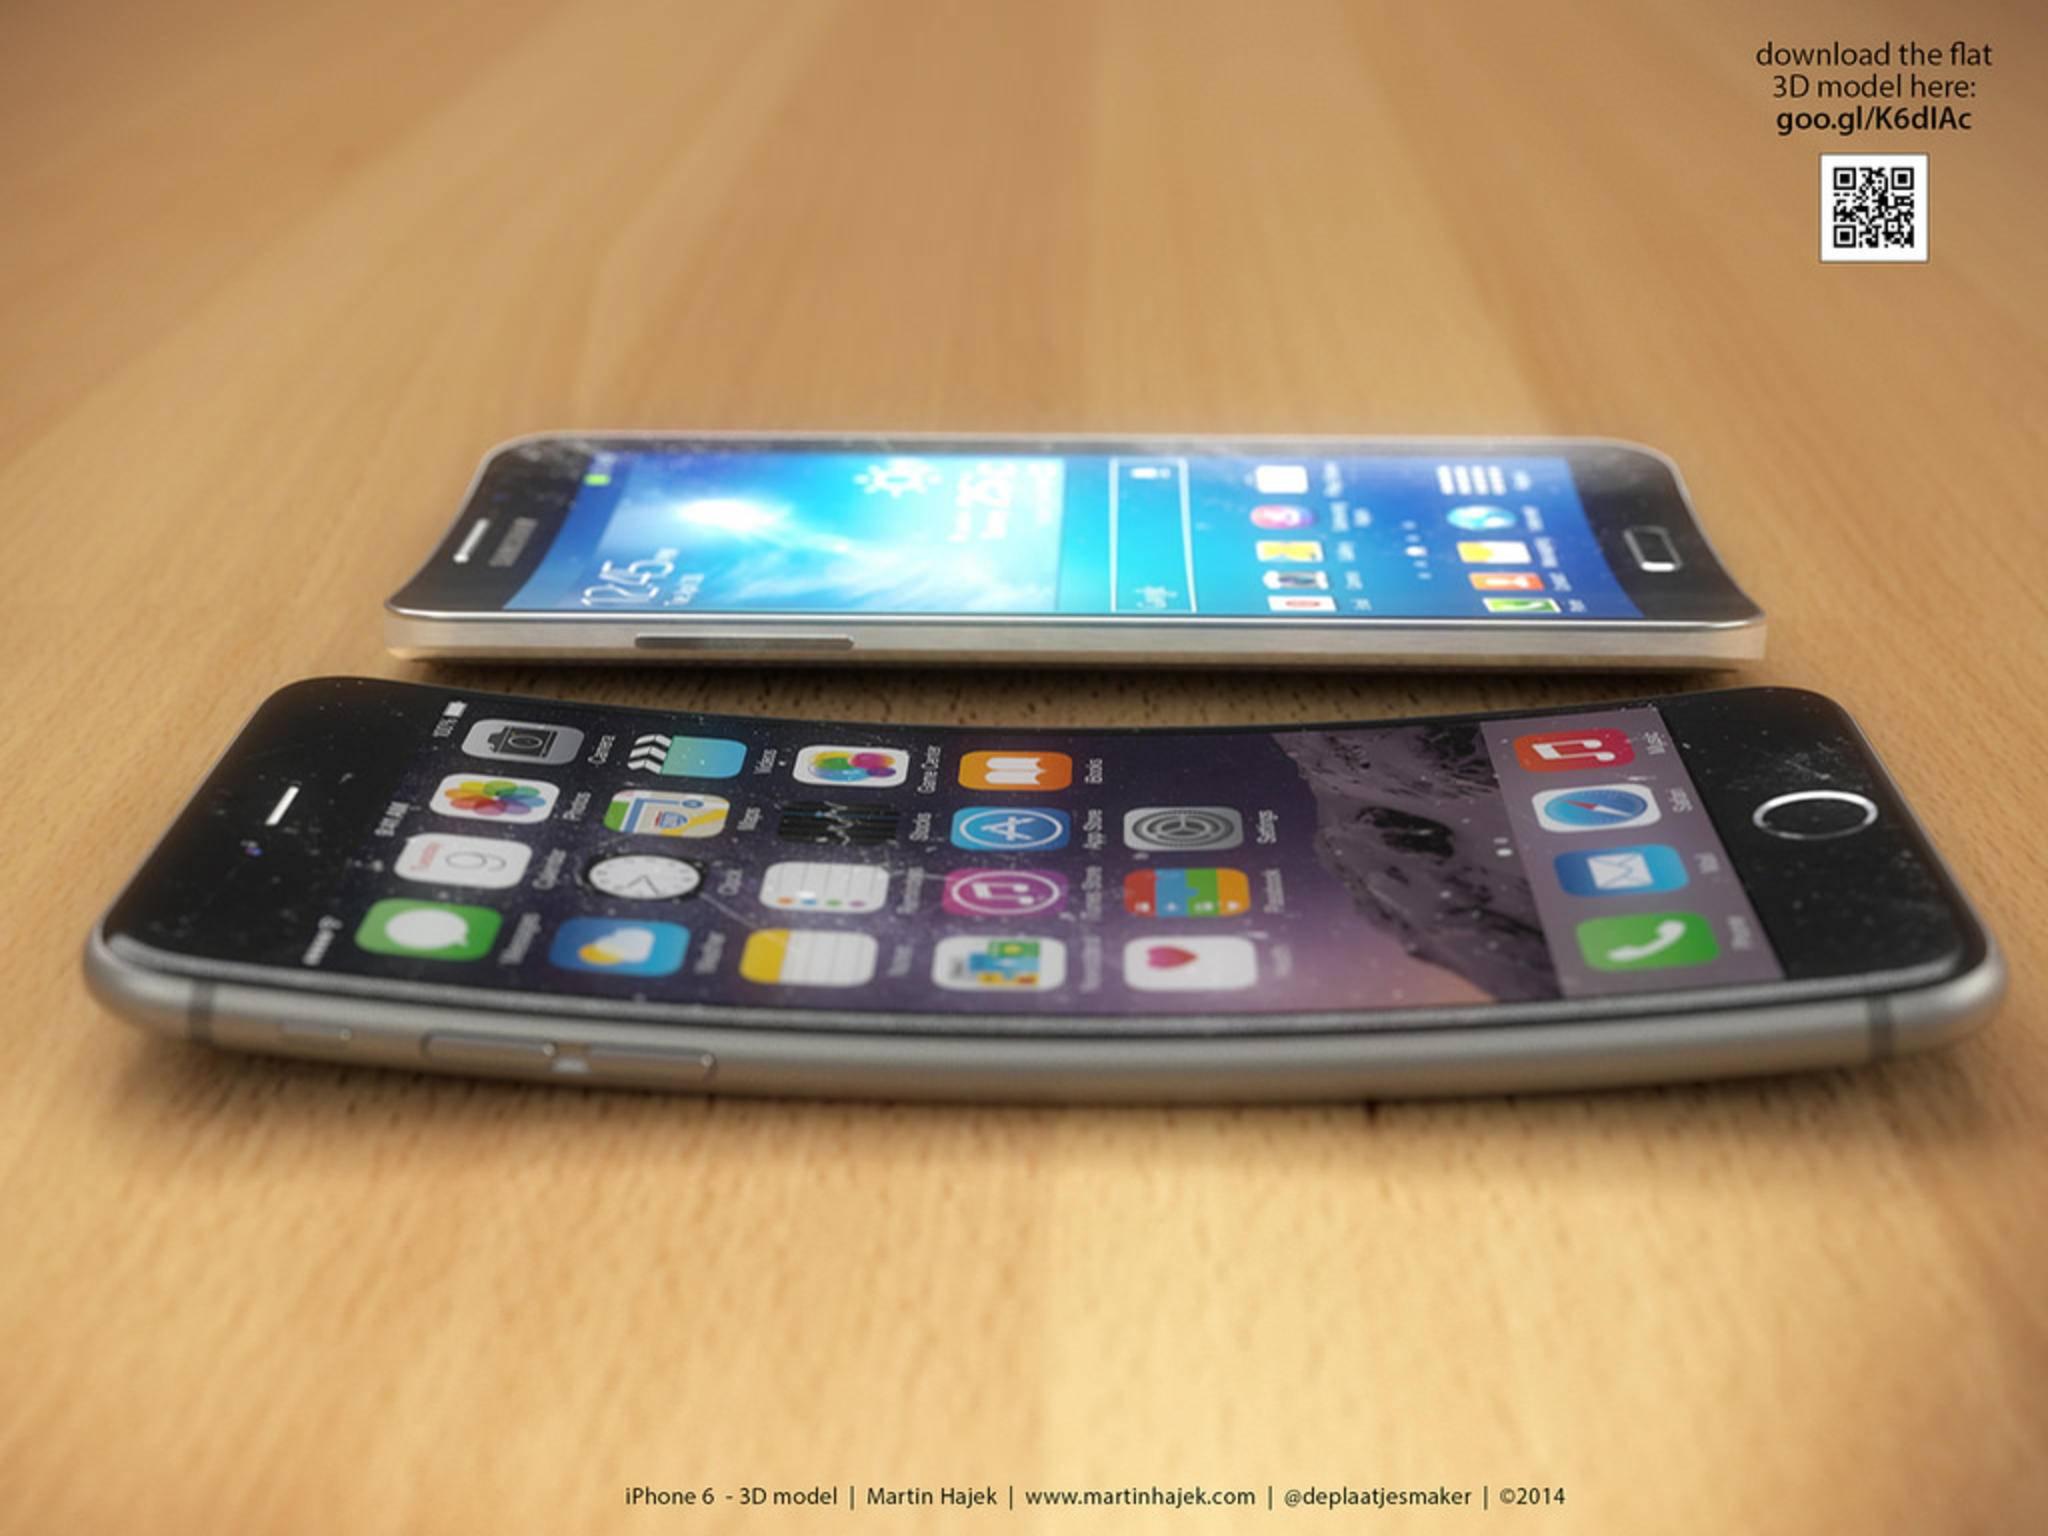 Gebogene iPhones gibt es bislang nur in Render-Konzepten.